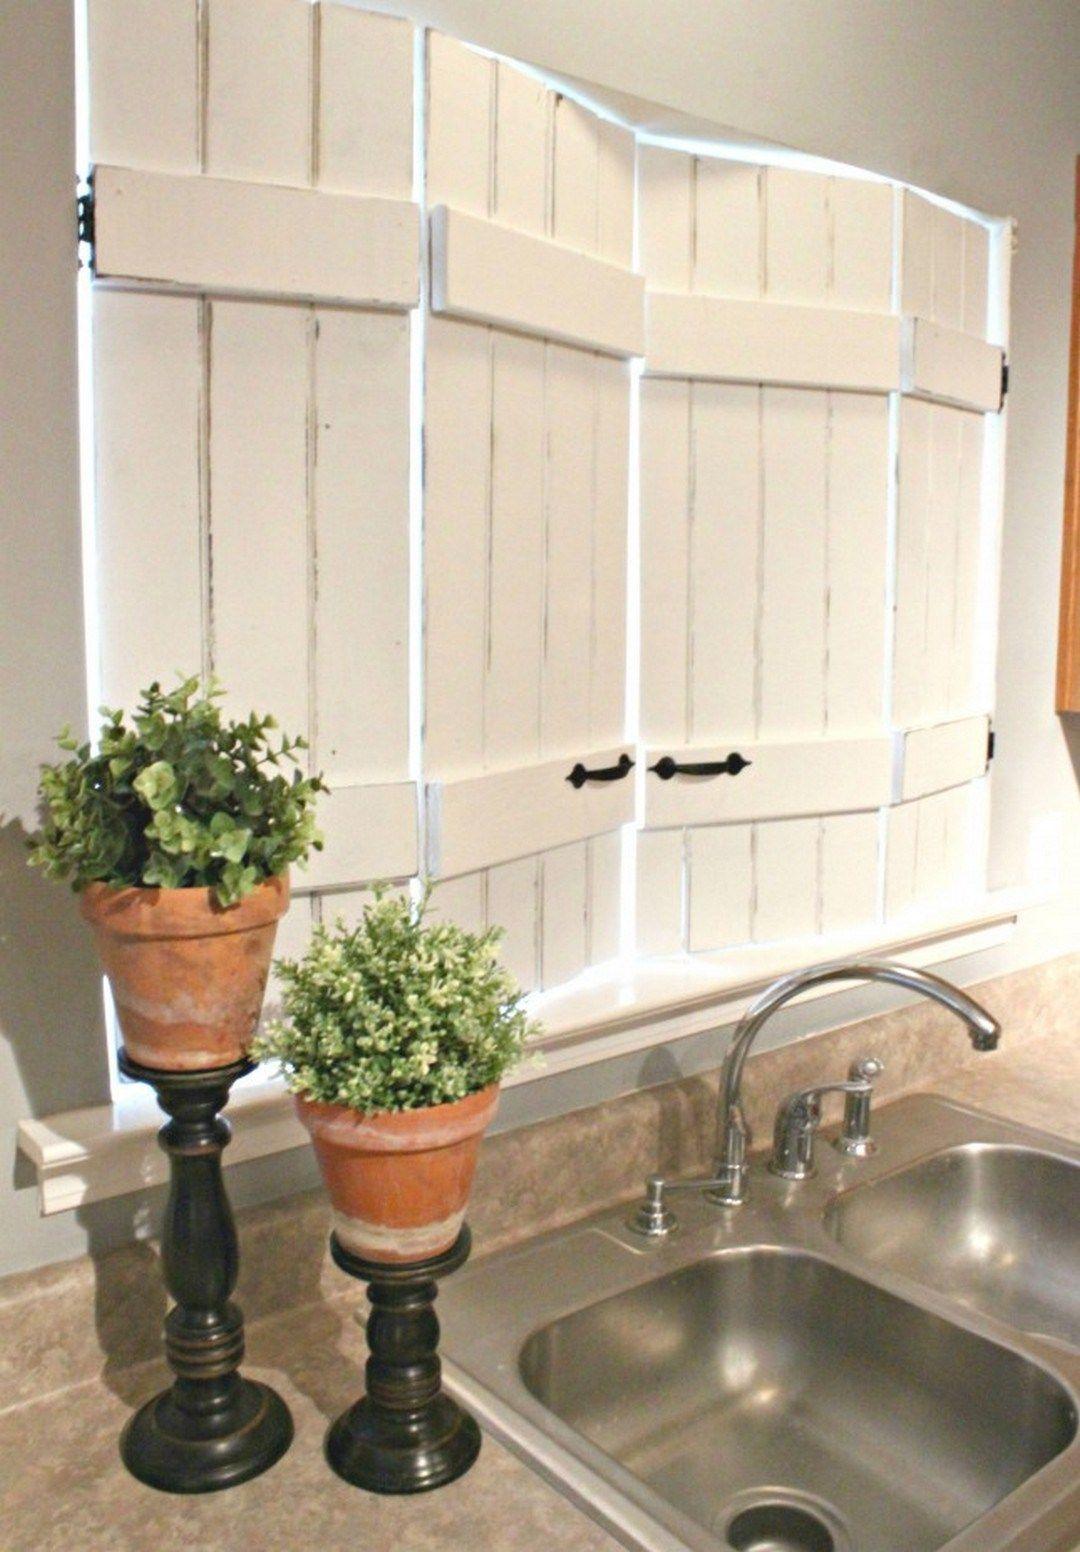 Window decor diy  home interior design tricks that you must know  diy home decor